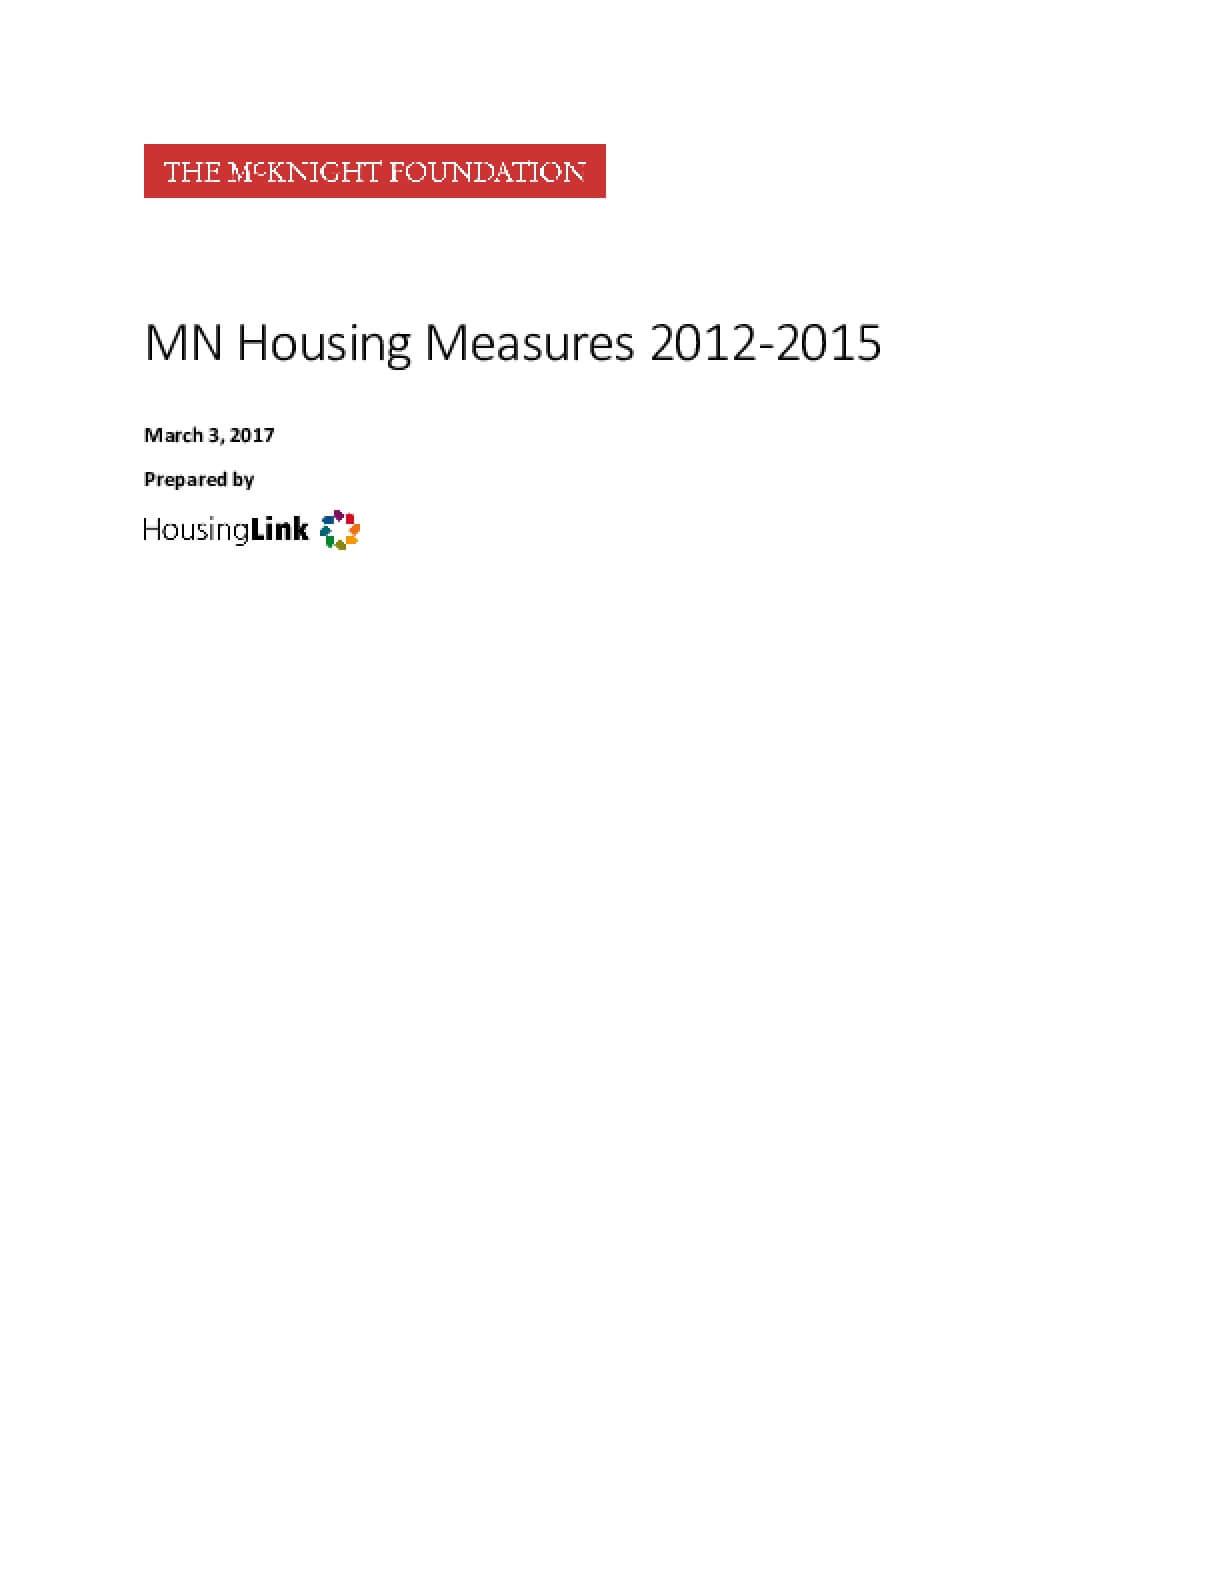 MN Housing Measures 2012-2015